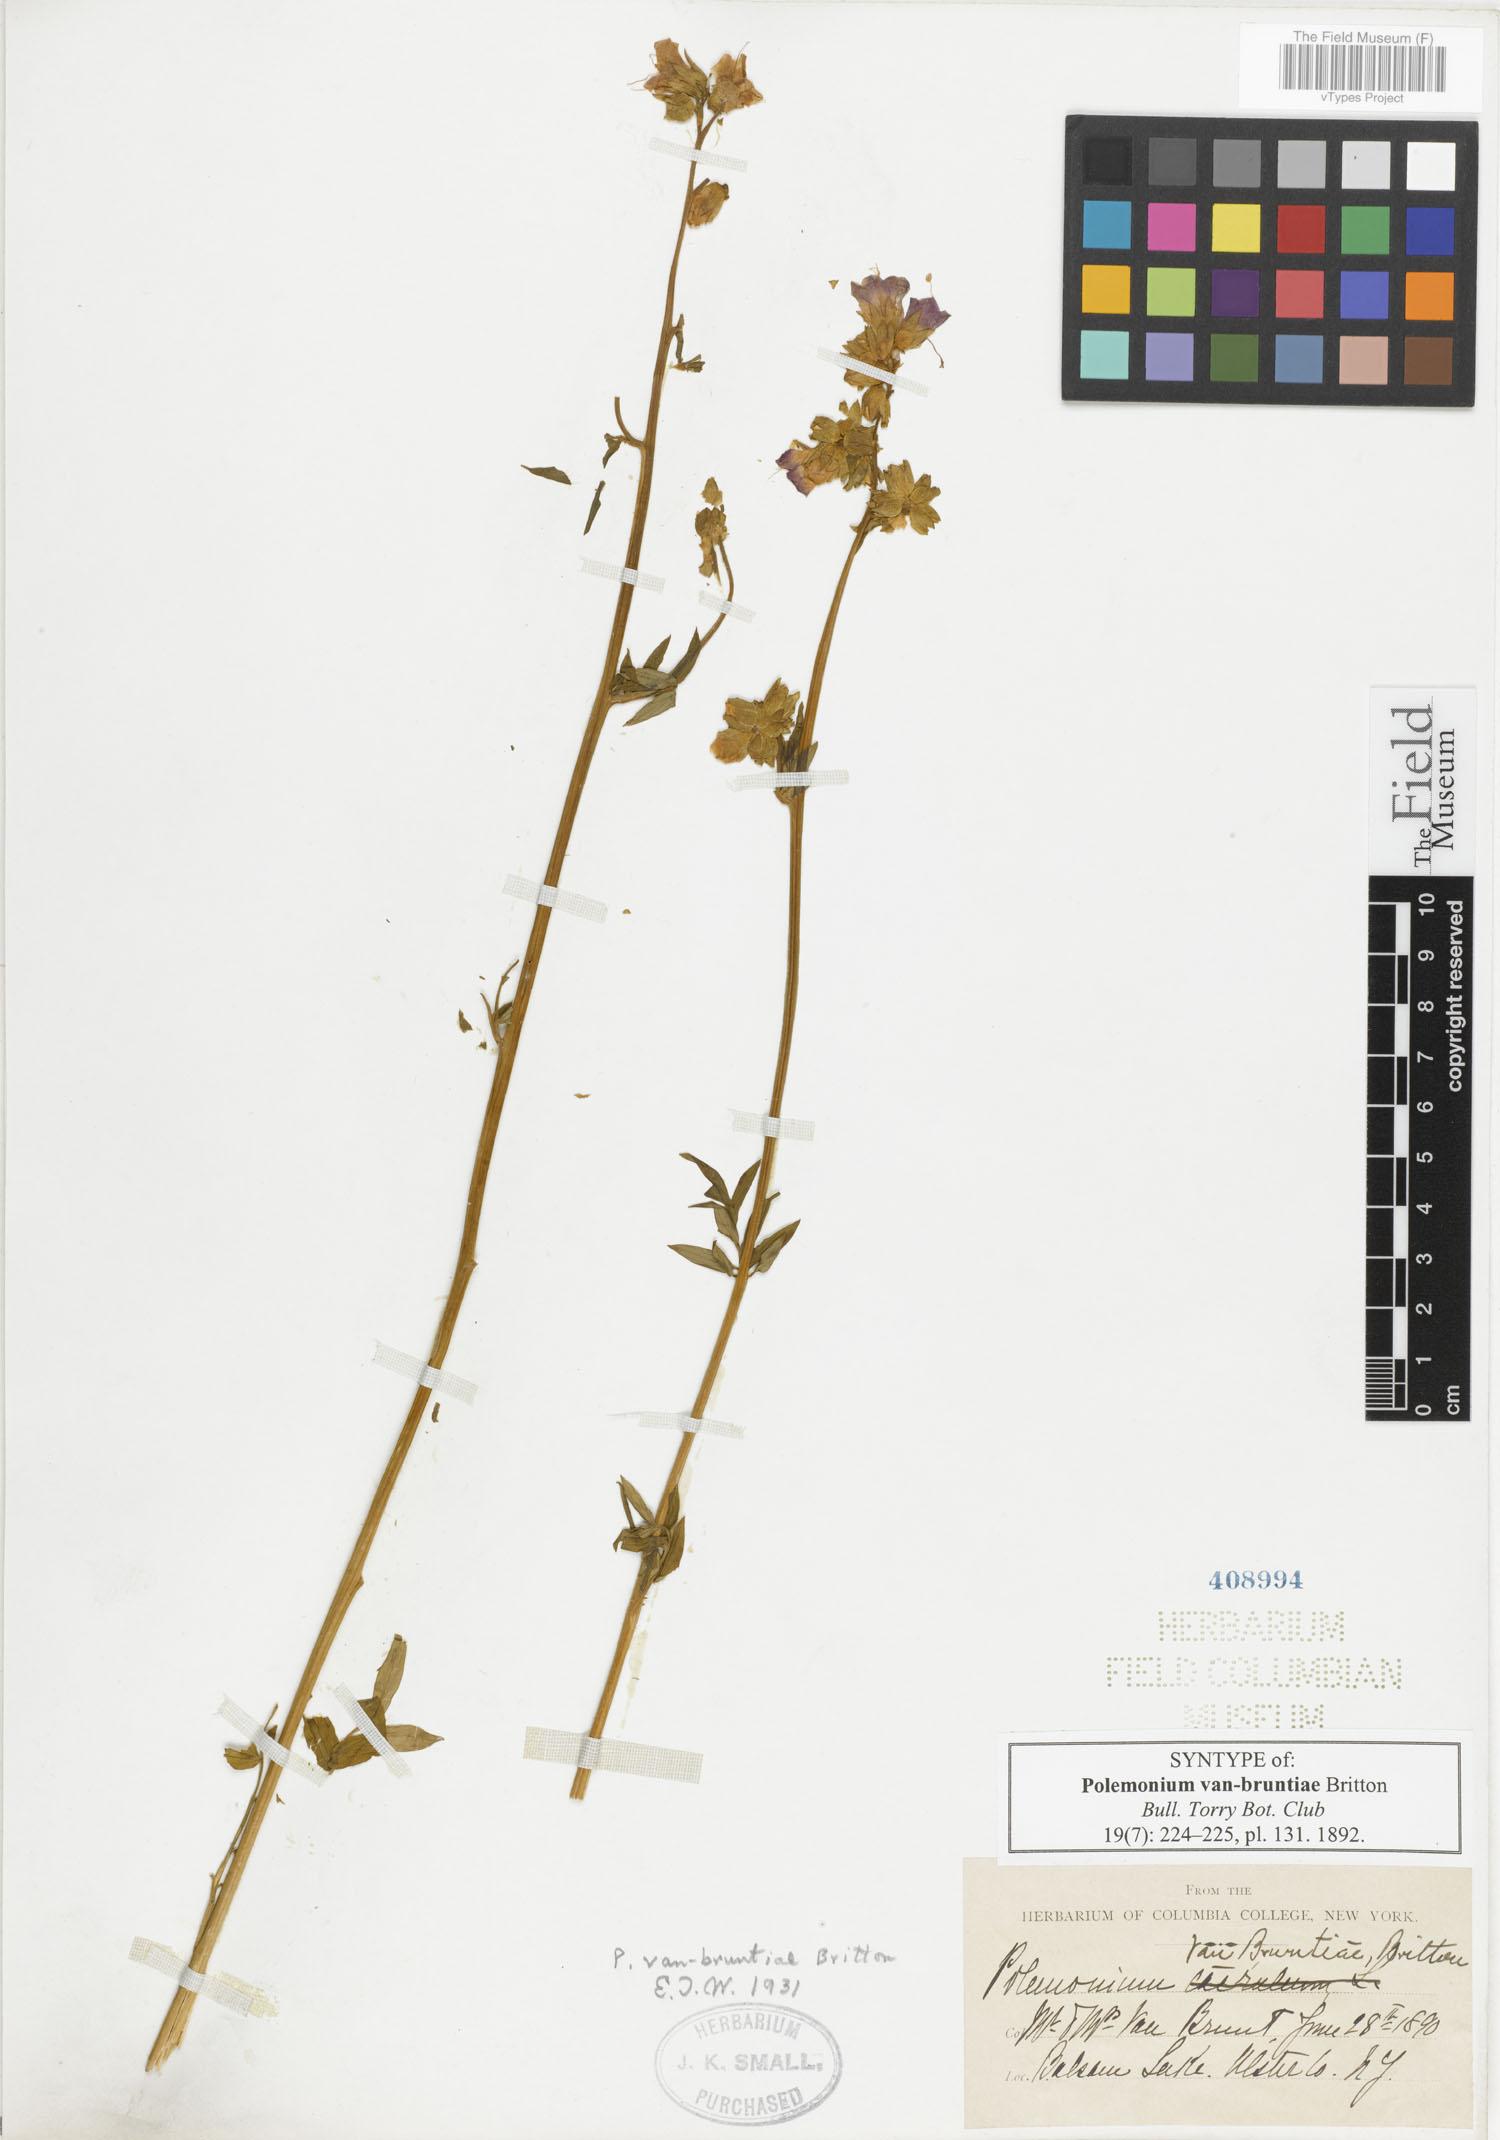 Polemonium van-bruntiae image